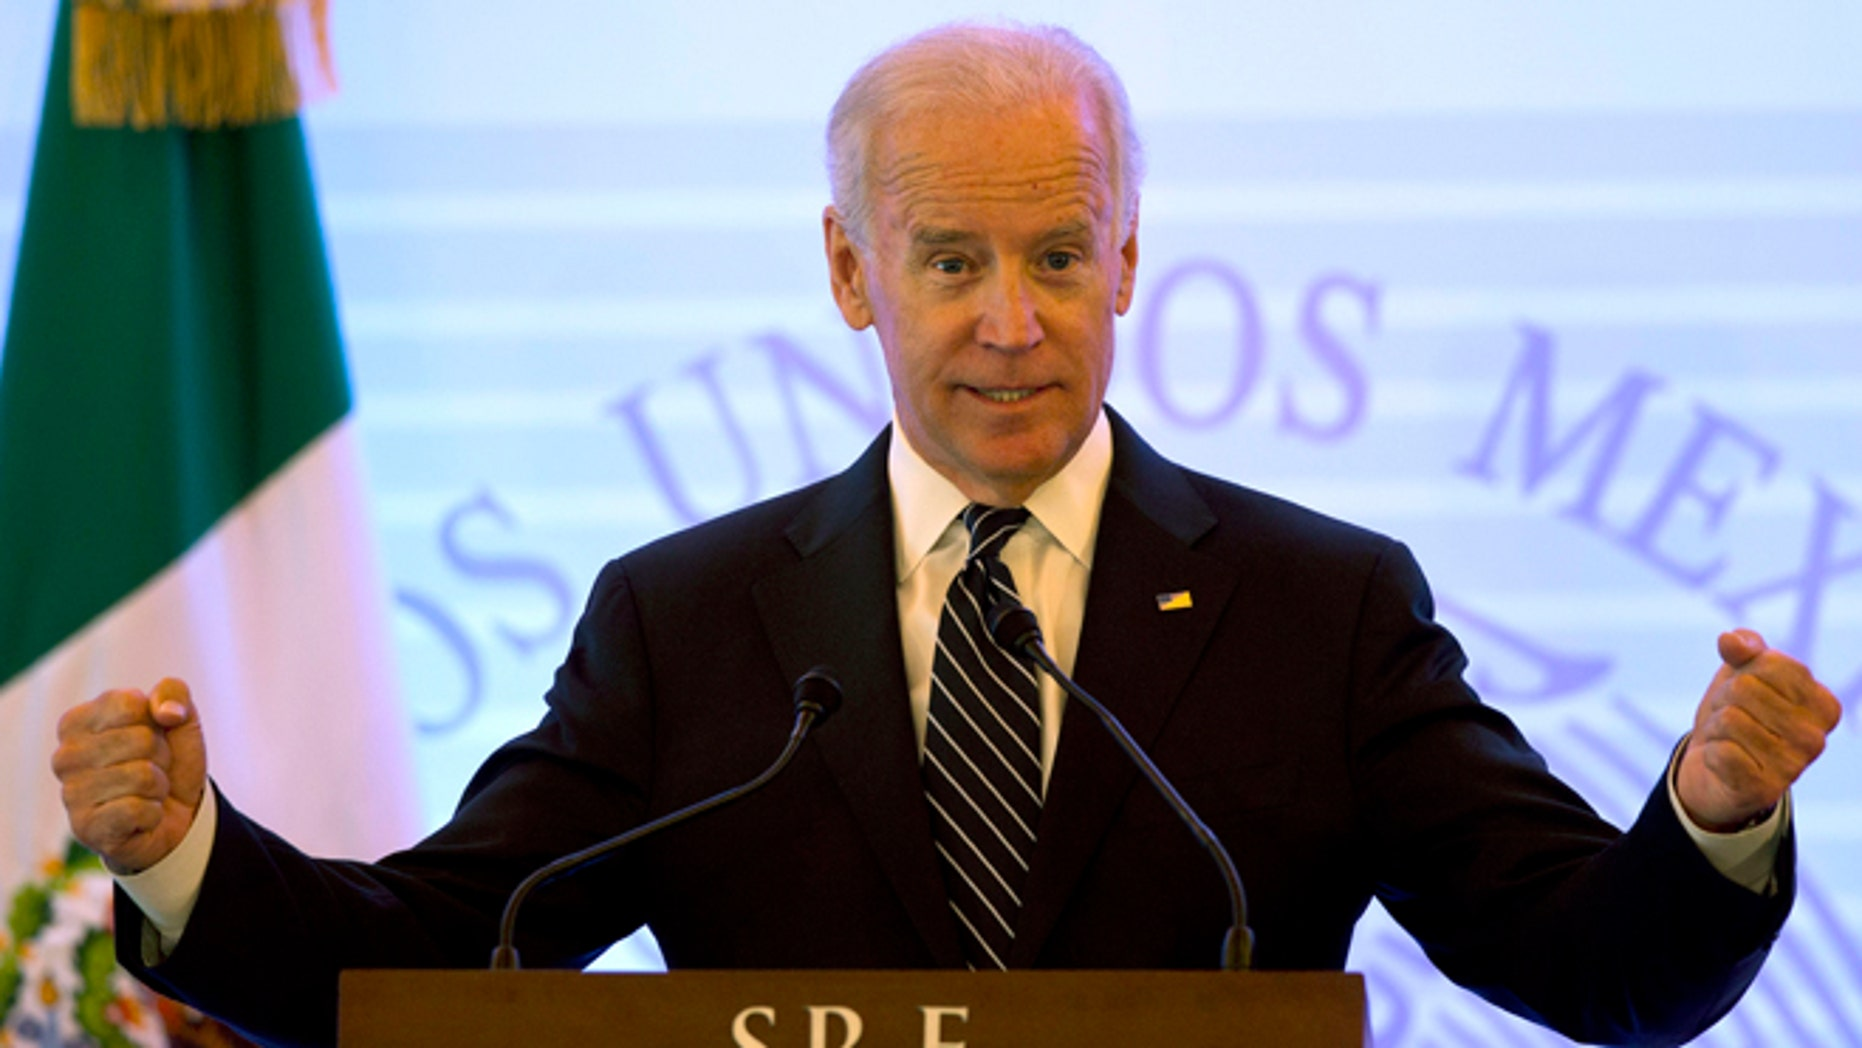 Vice President Biden in Mexico City, on Sept. 20, 2013.